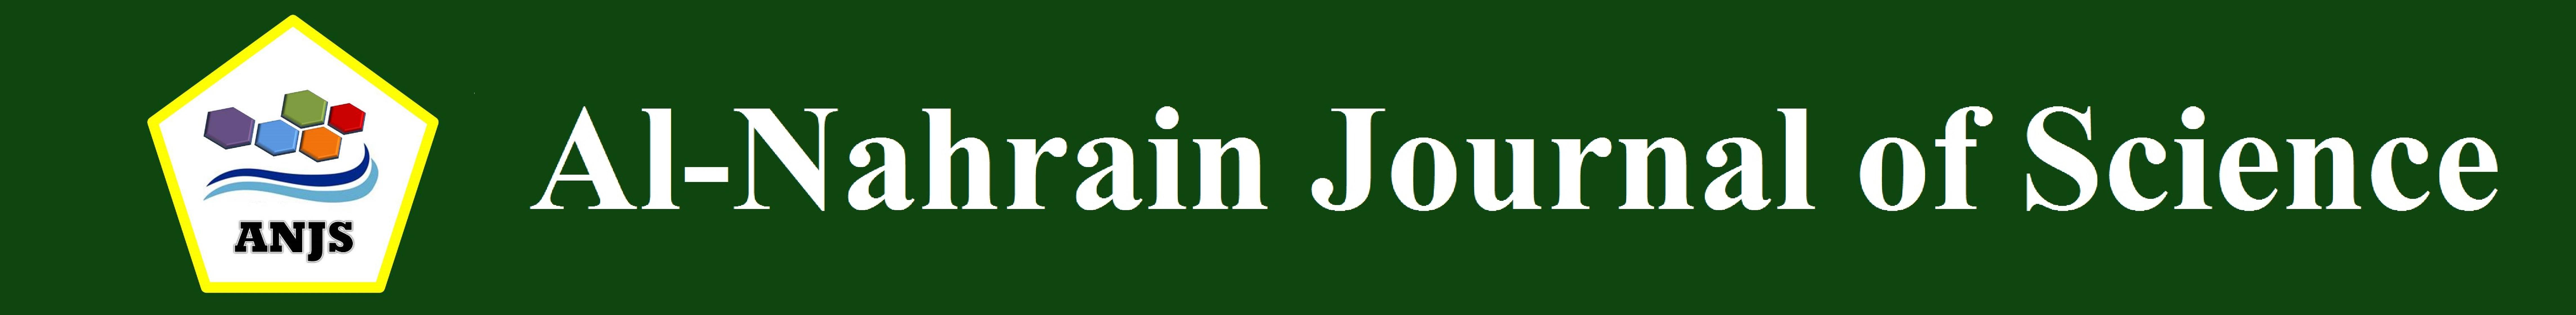 Al-Nahrain Journal of Science (ANJS)